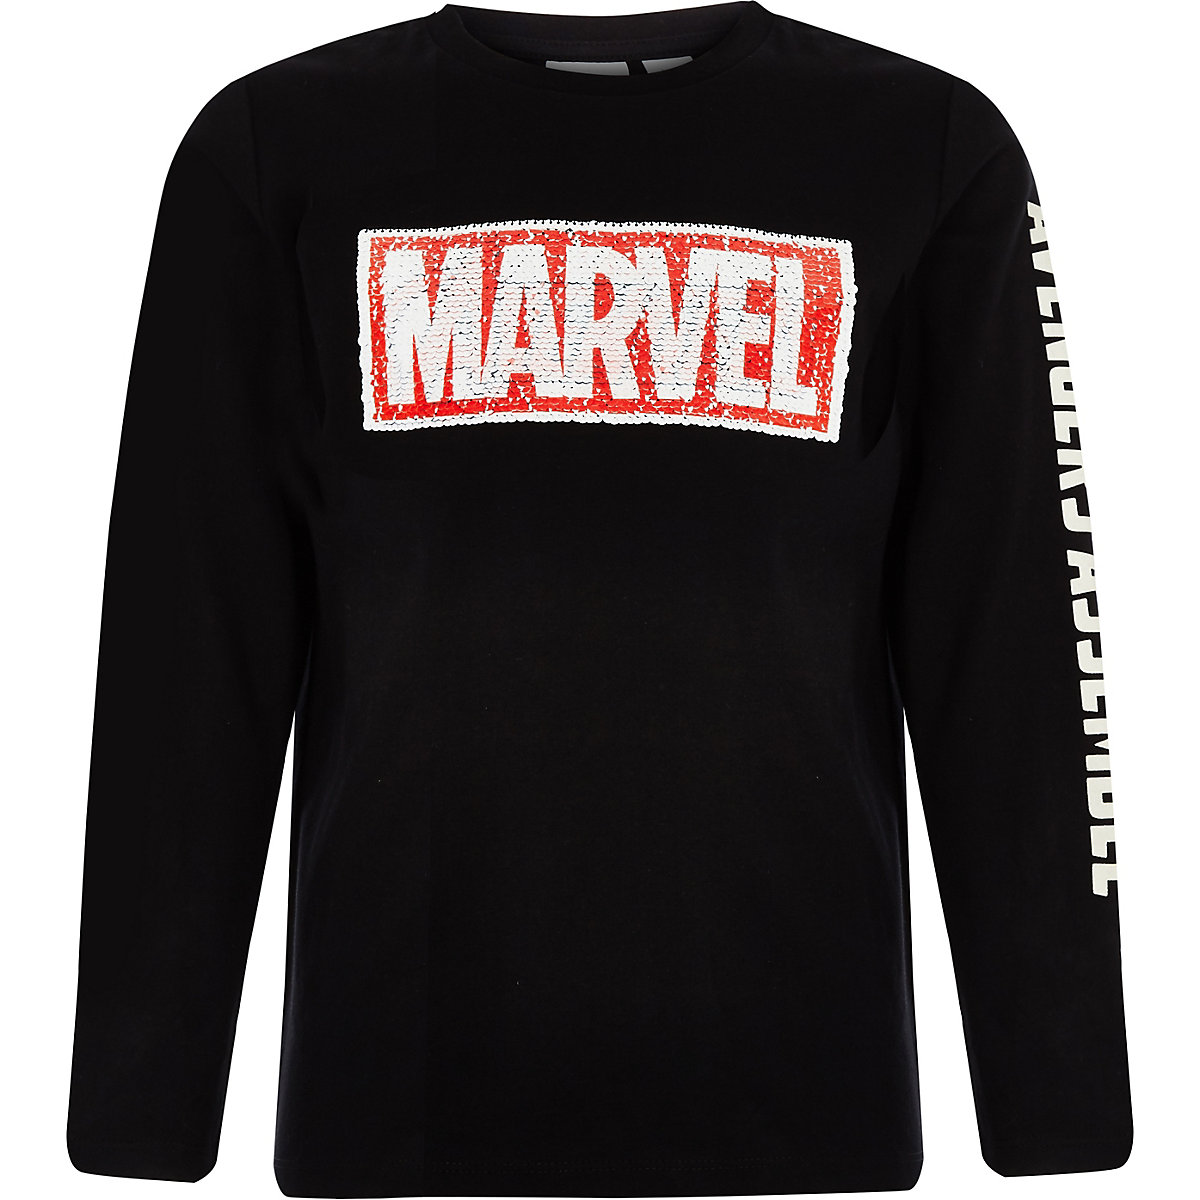 Boys black Marvel reverse sequin T-shirt